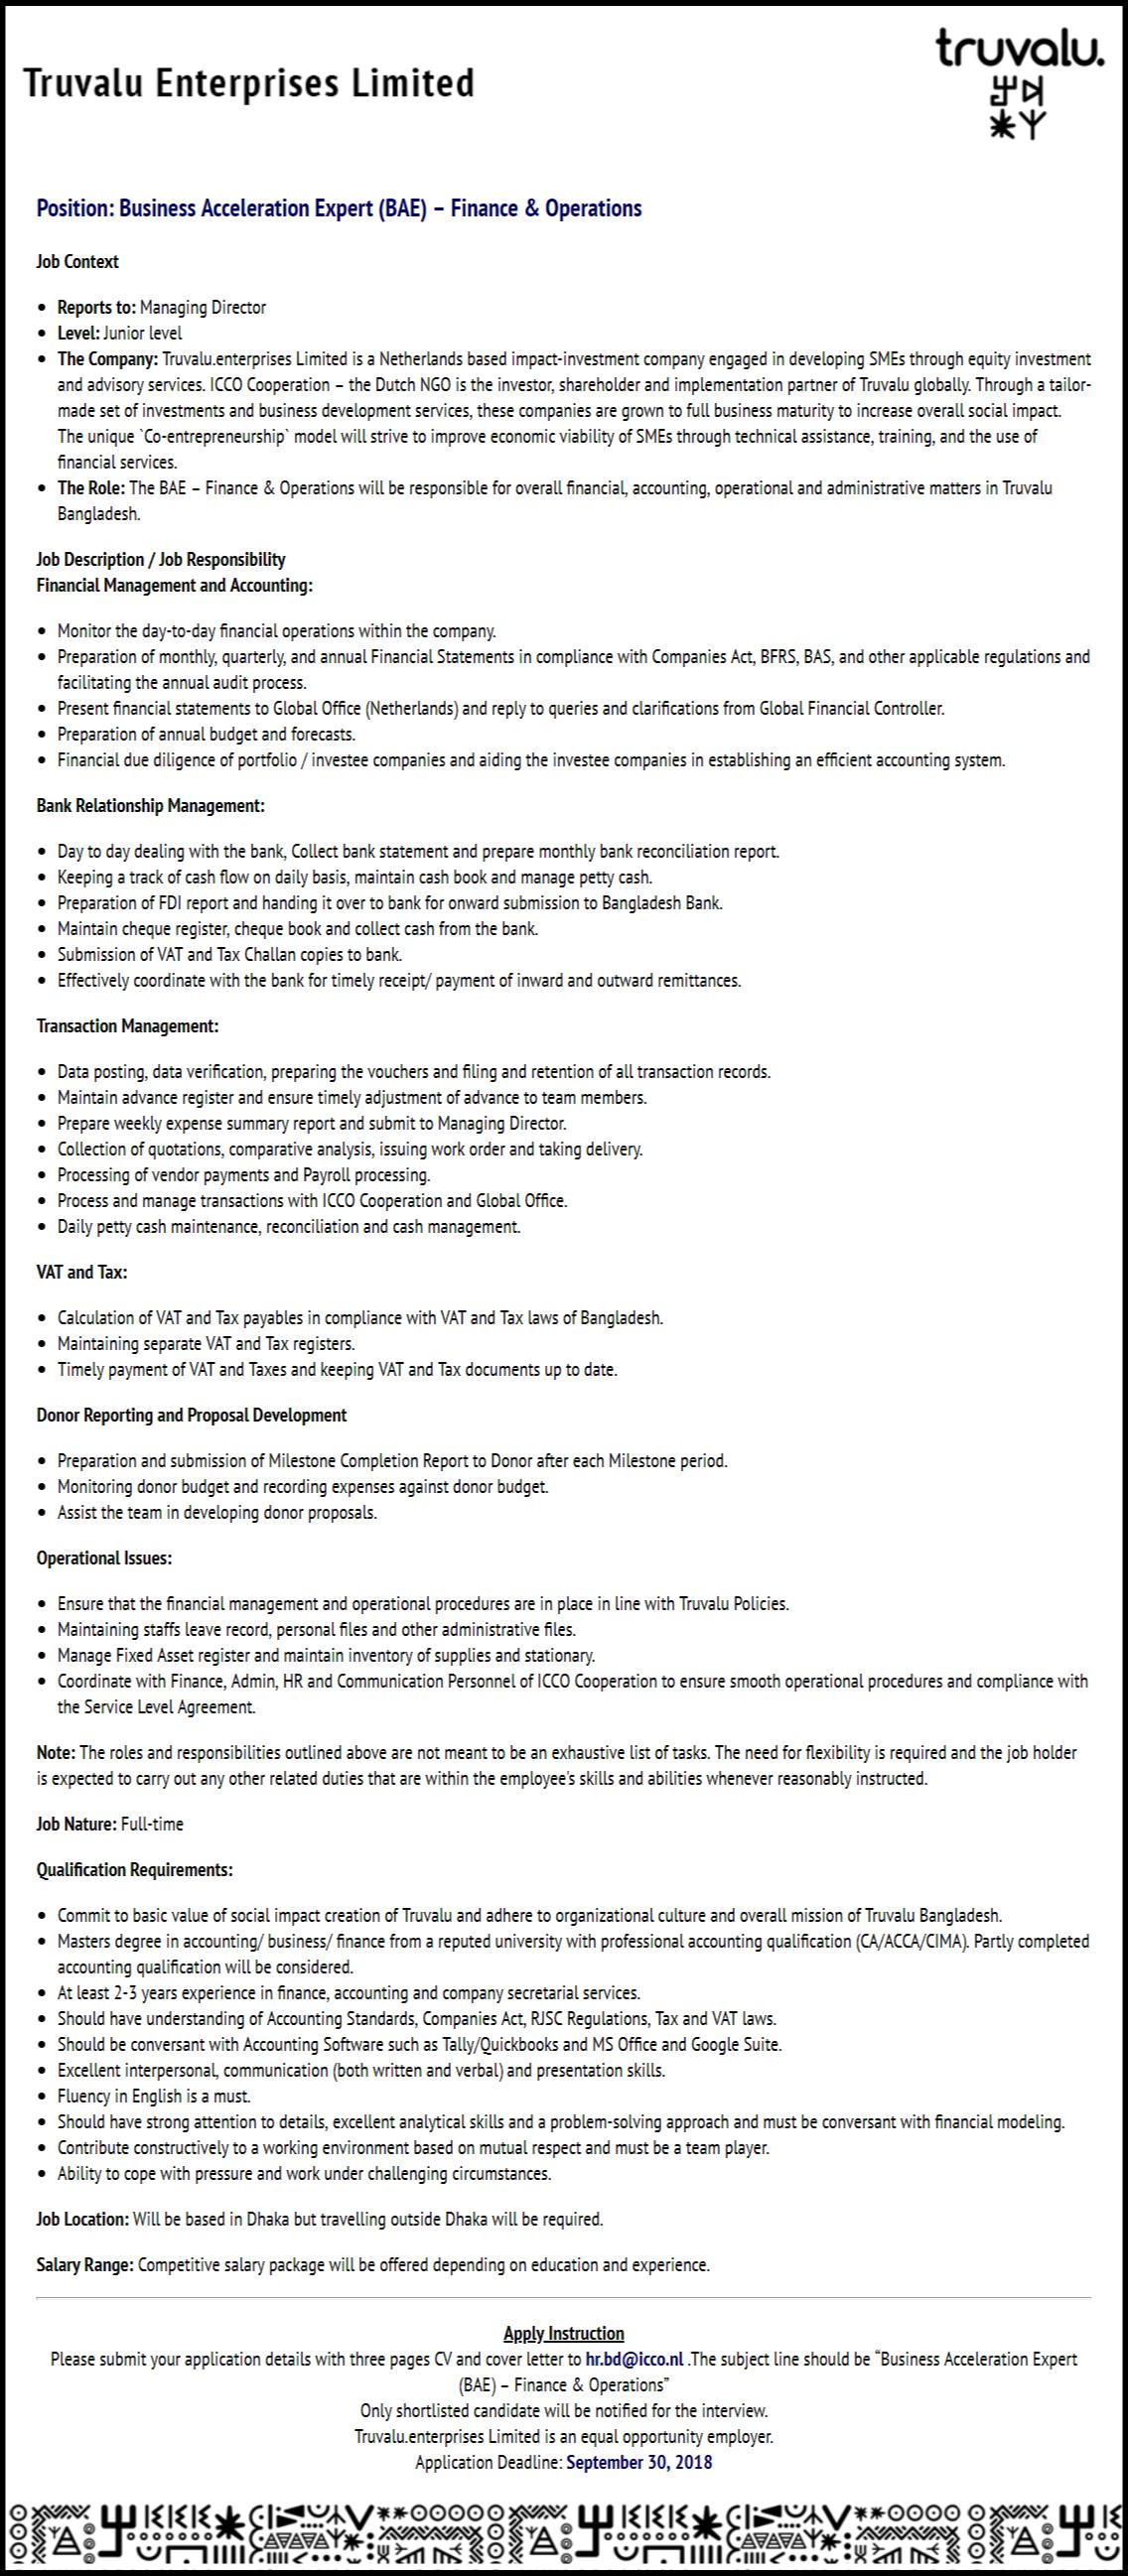 Truvalu Enterprises Ltd Job Circular